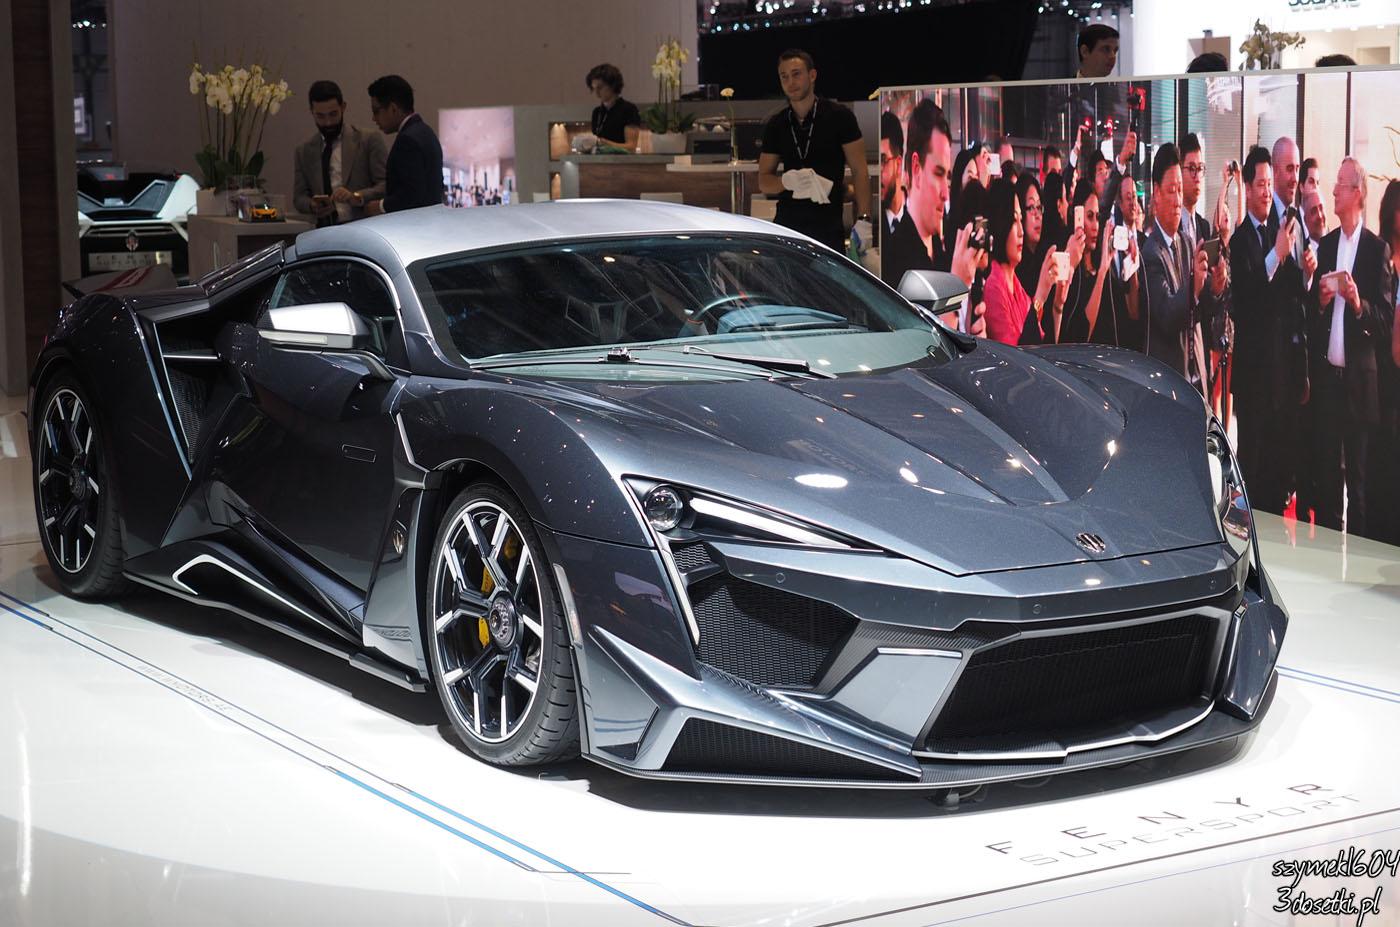 Geneva motor show 2018 relacja - Geneva car show ...